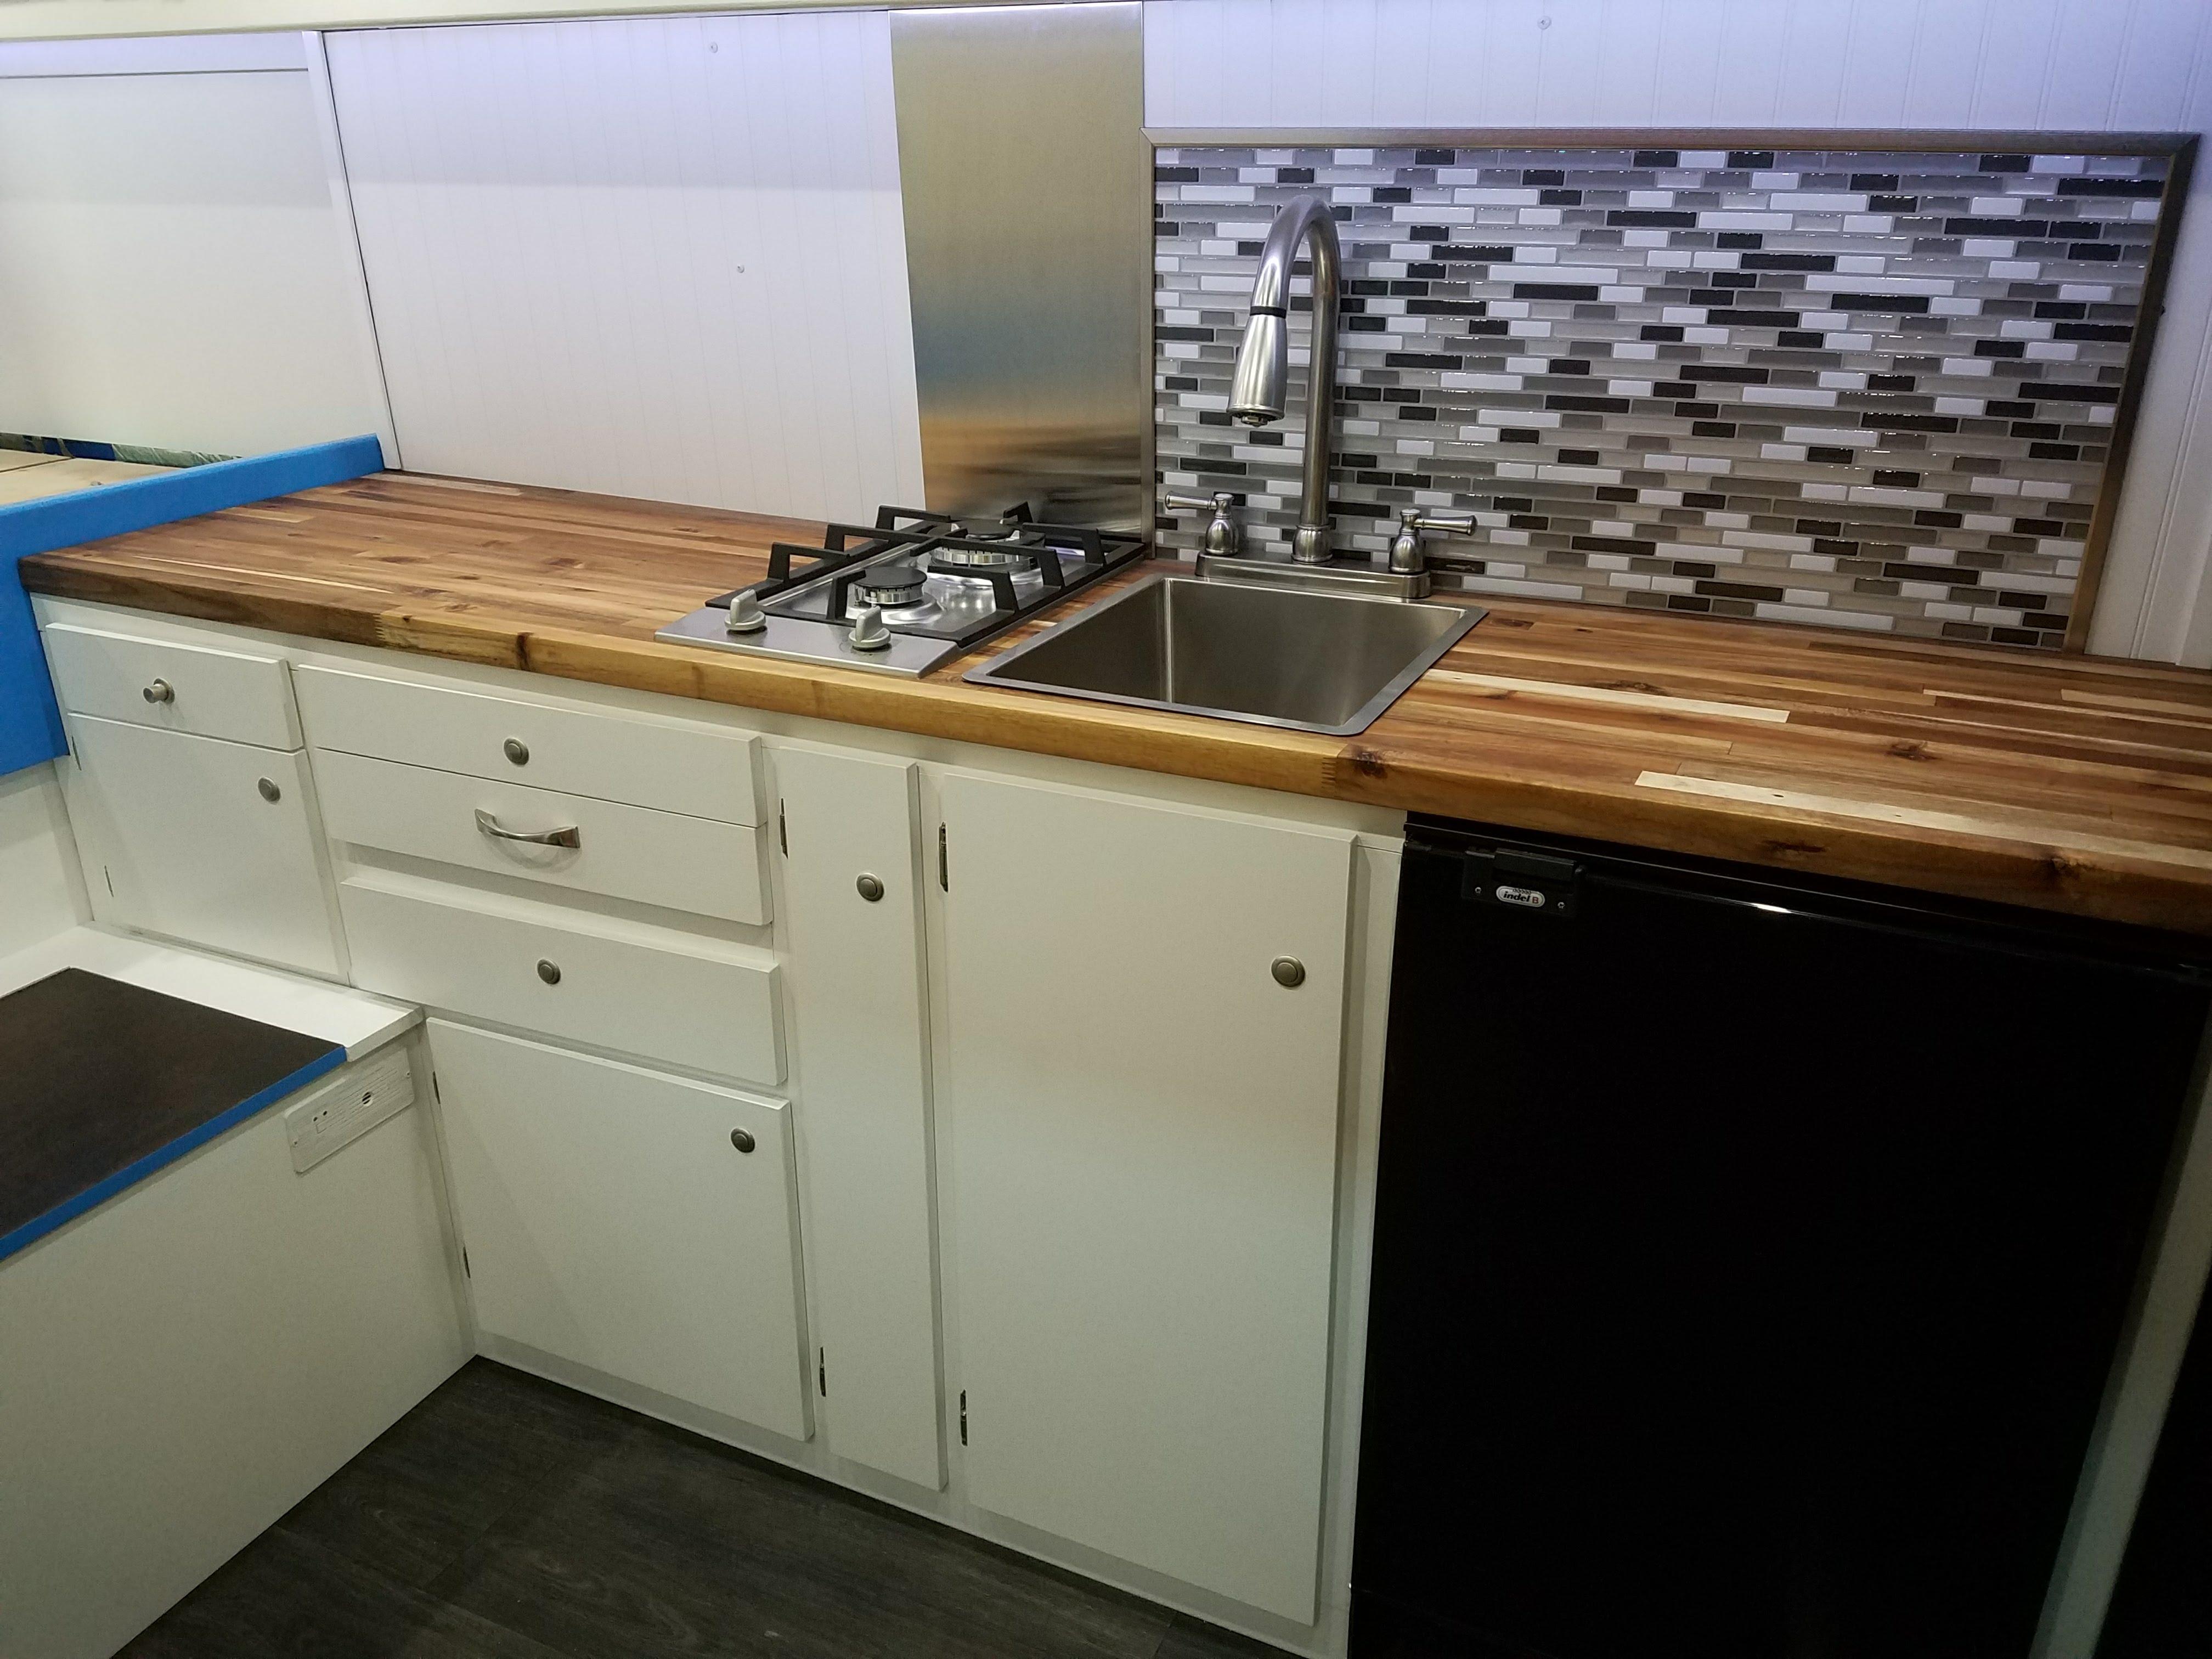 promaster van conversion kitchen